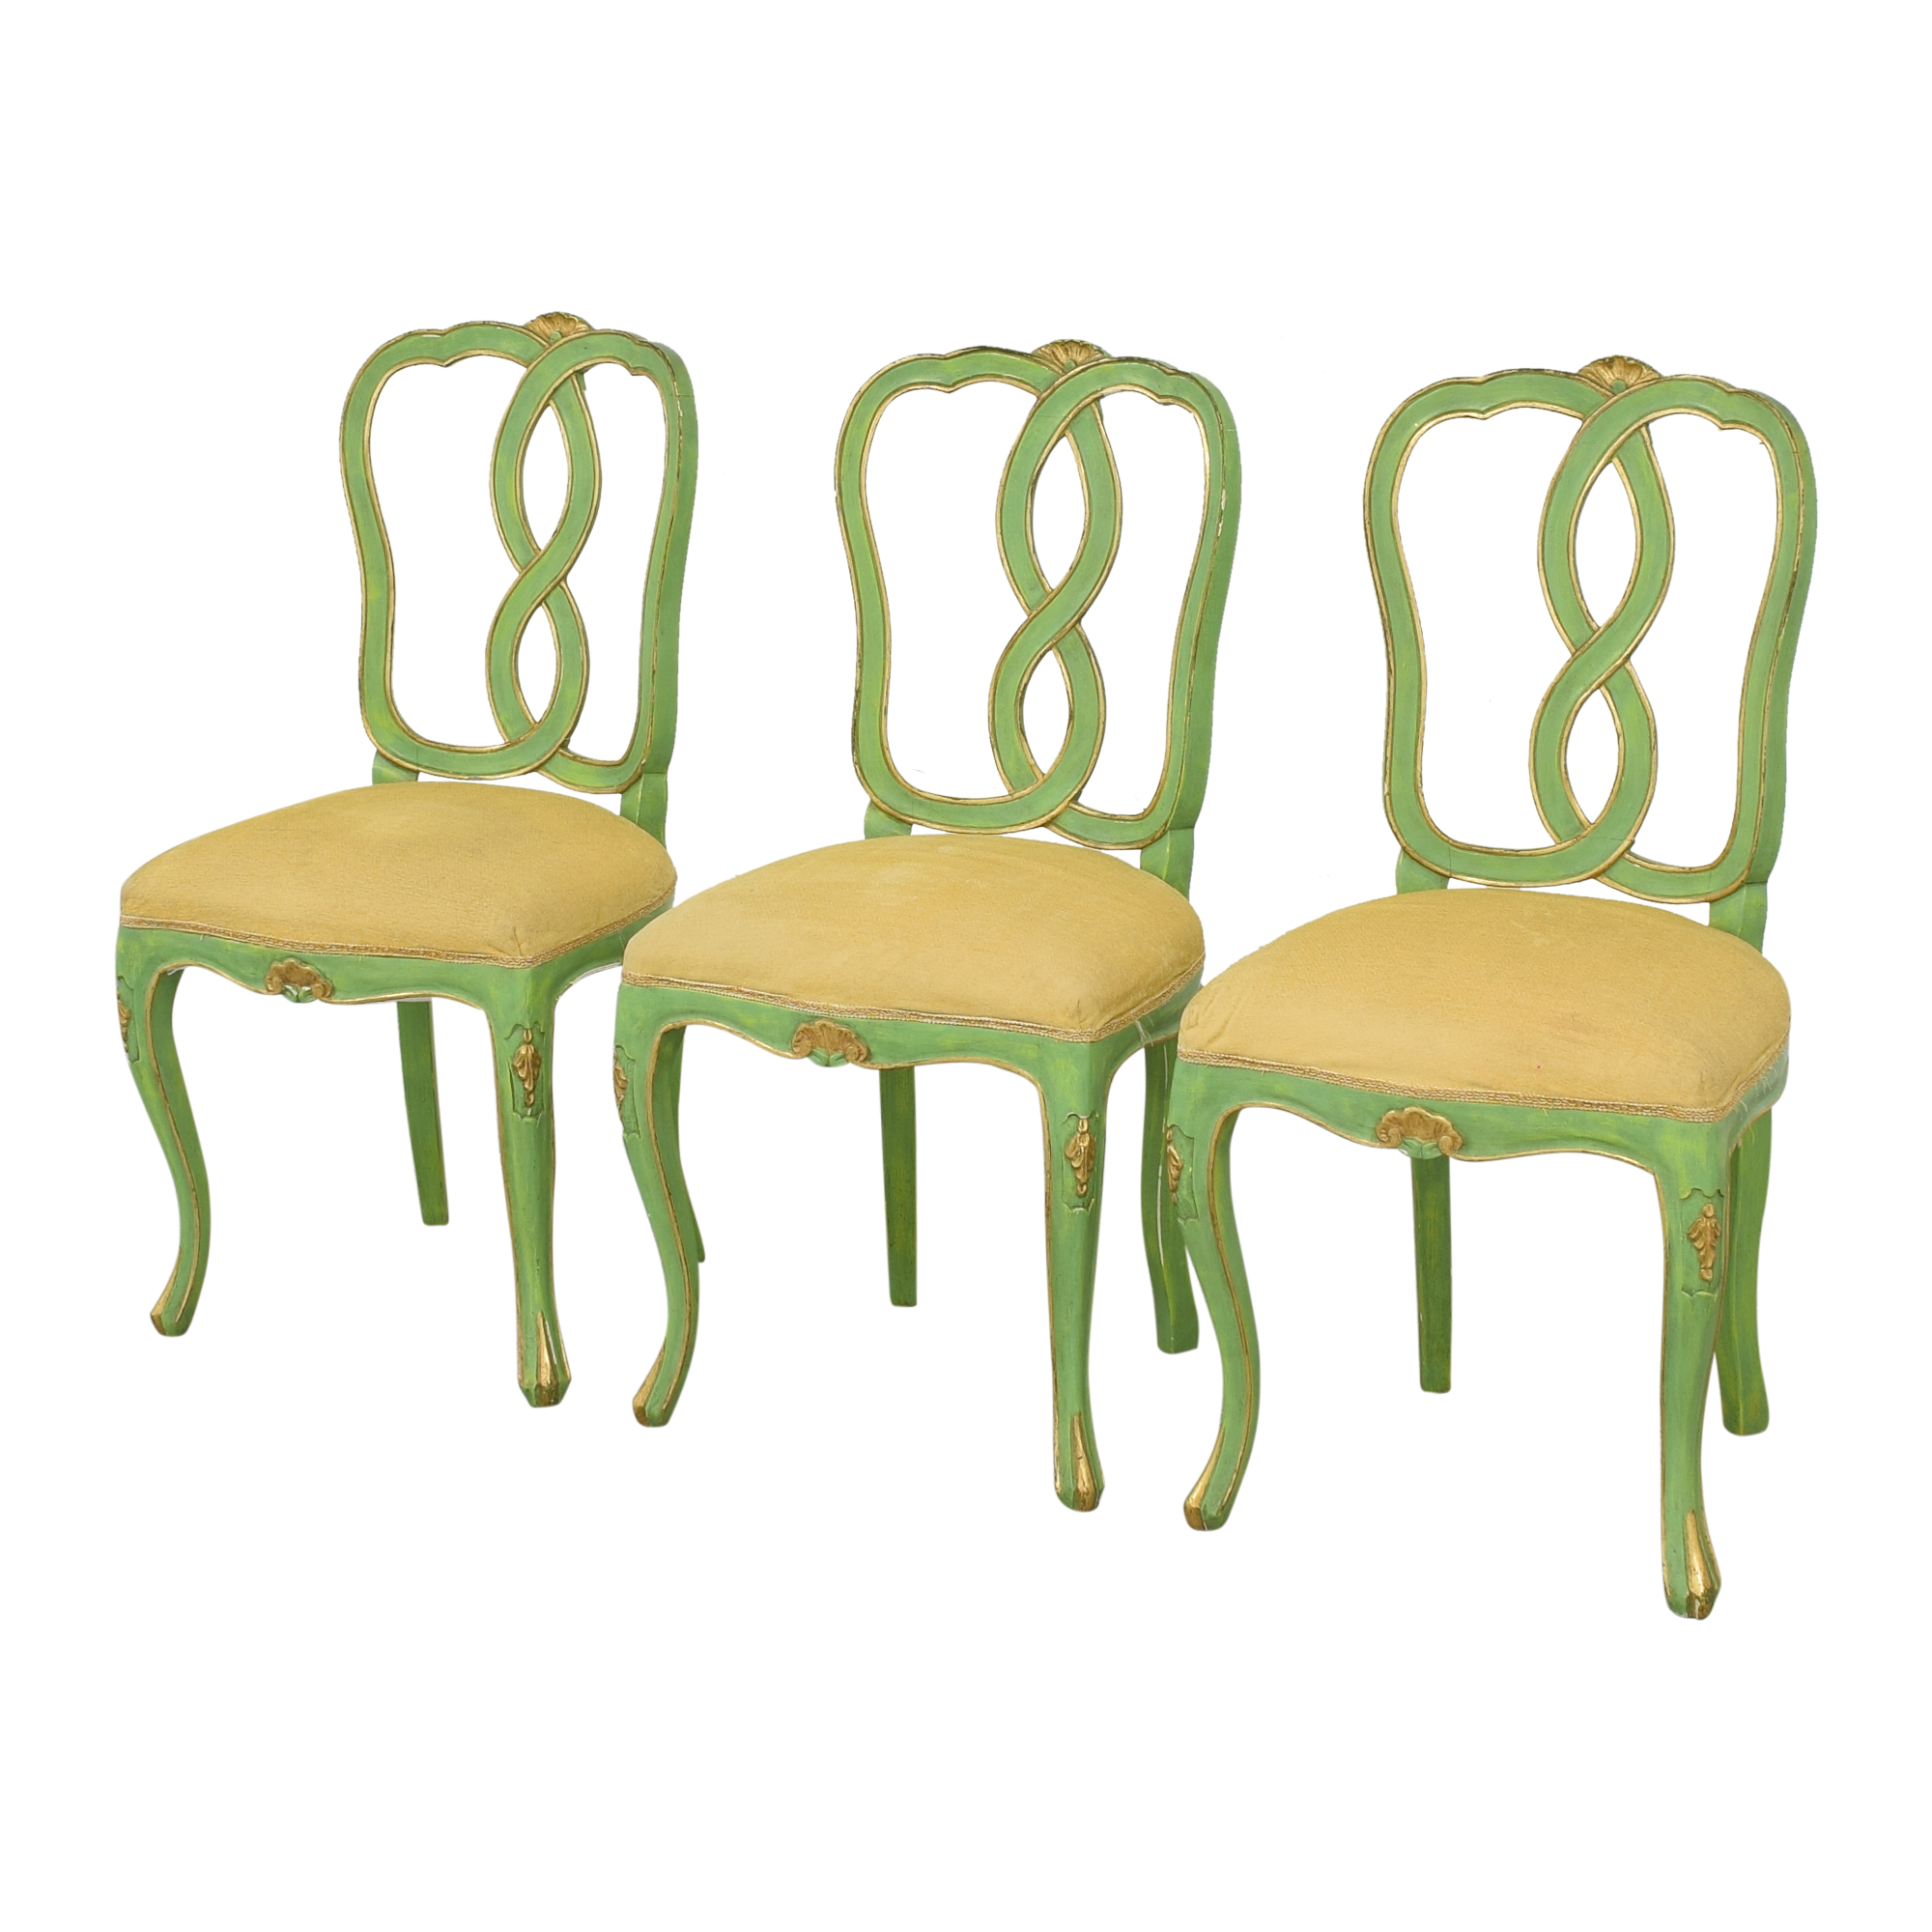 Bergdorf Goodman Bergdorf Goodman Green and Gold Chairs used